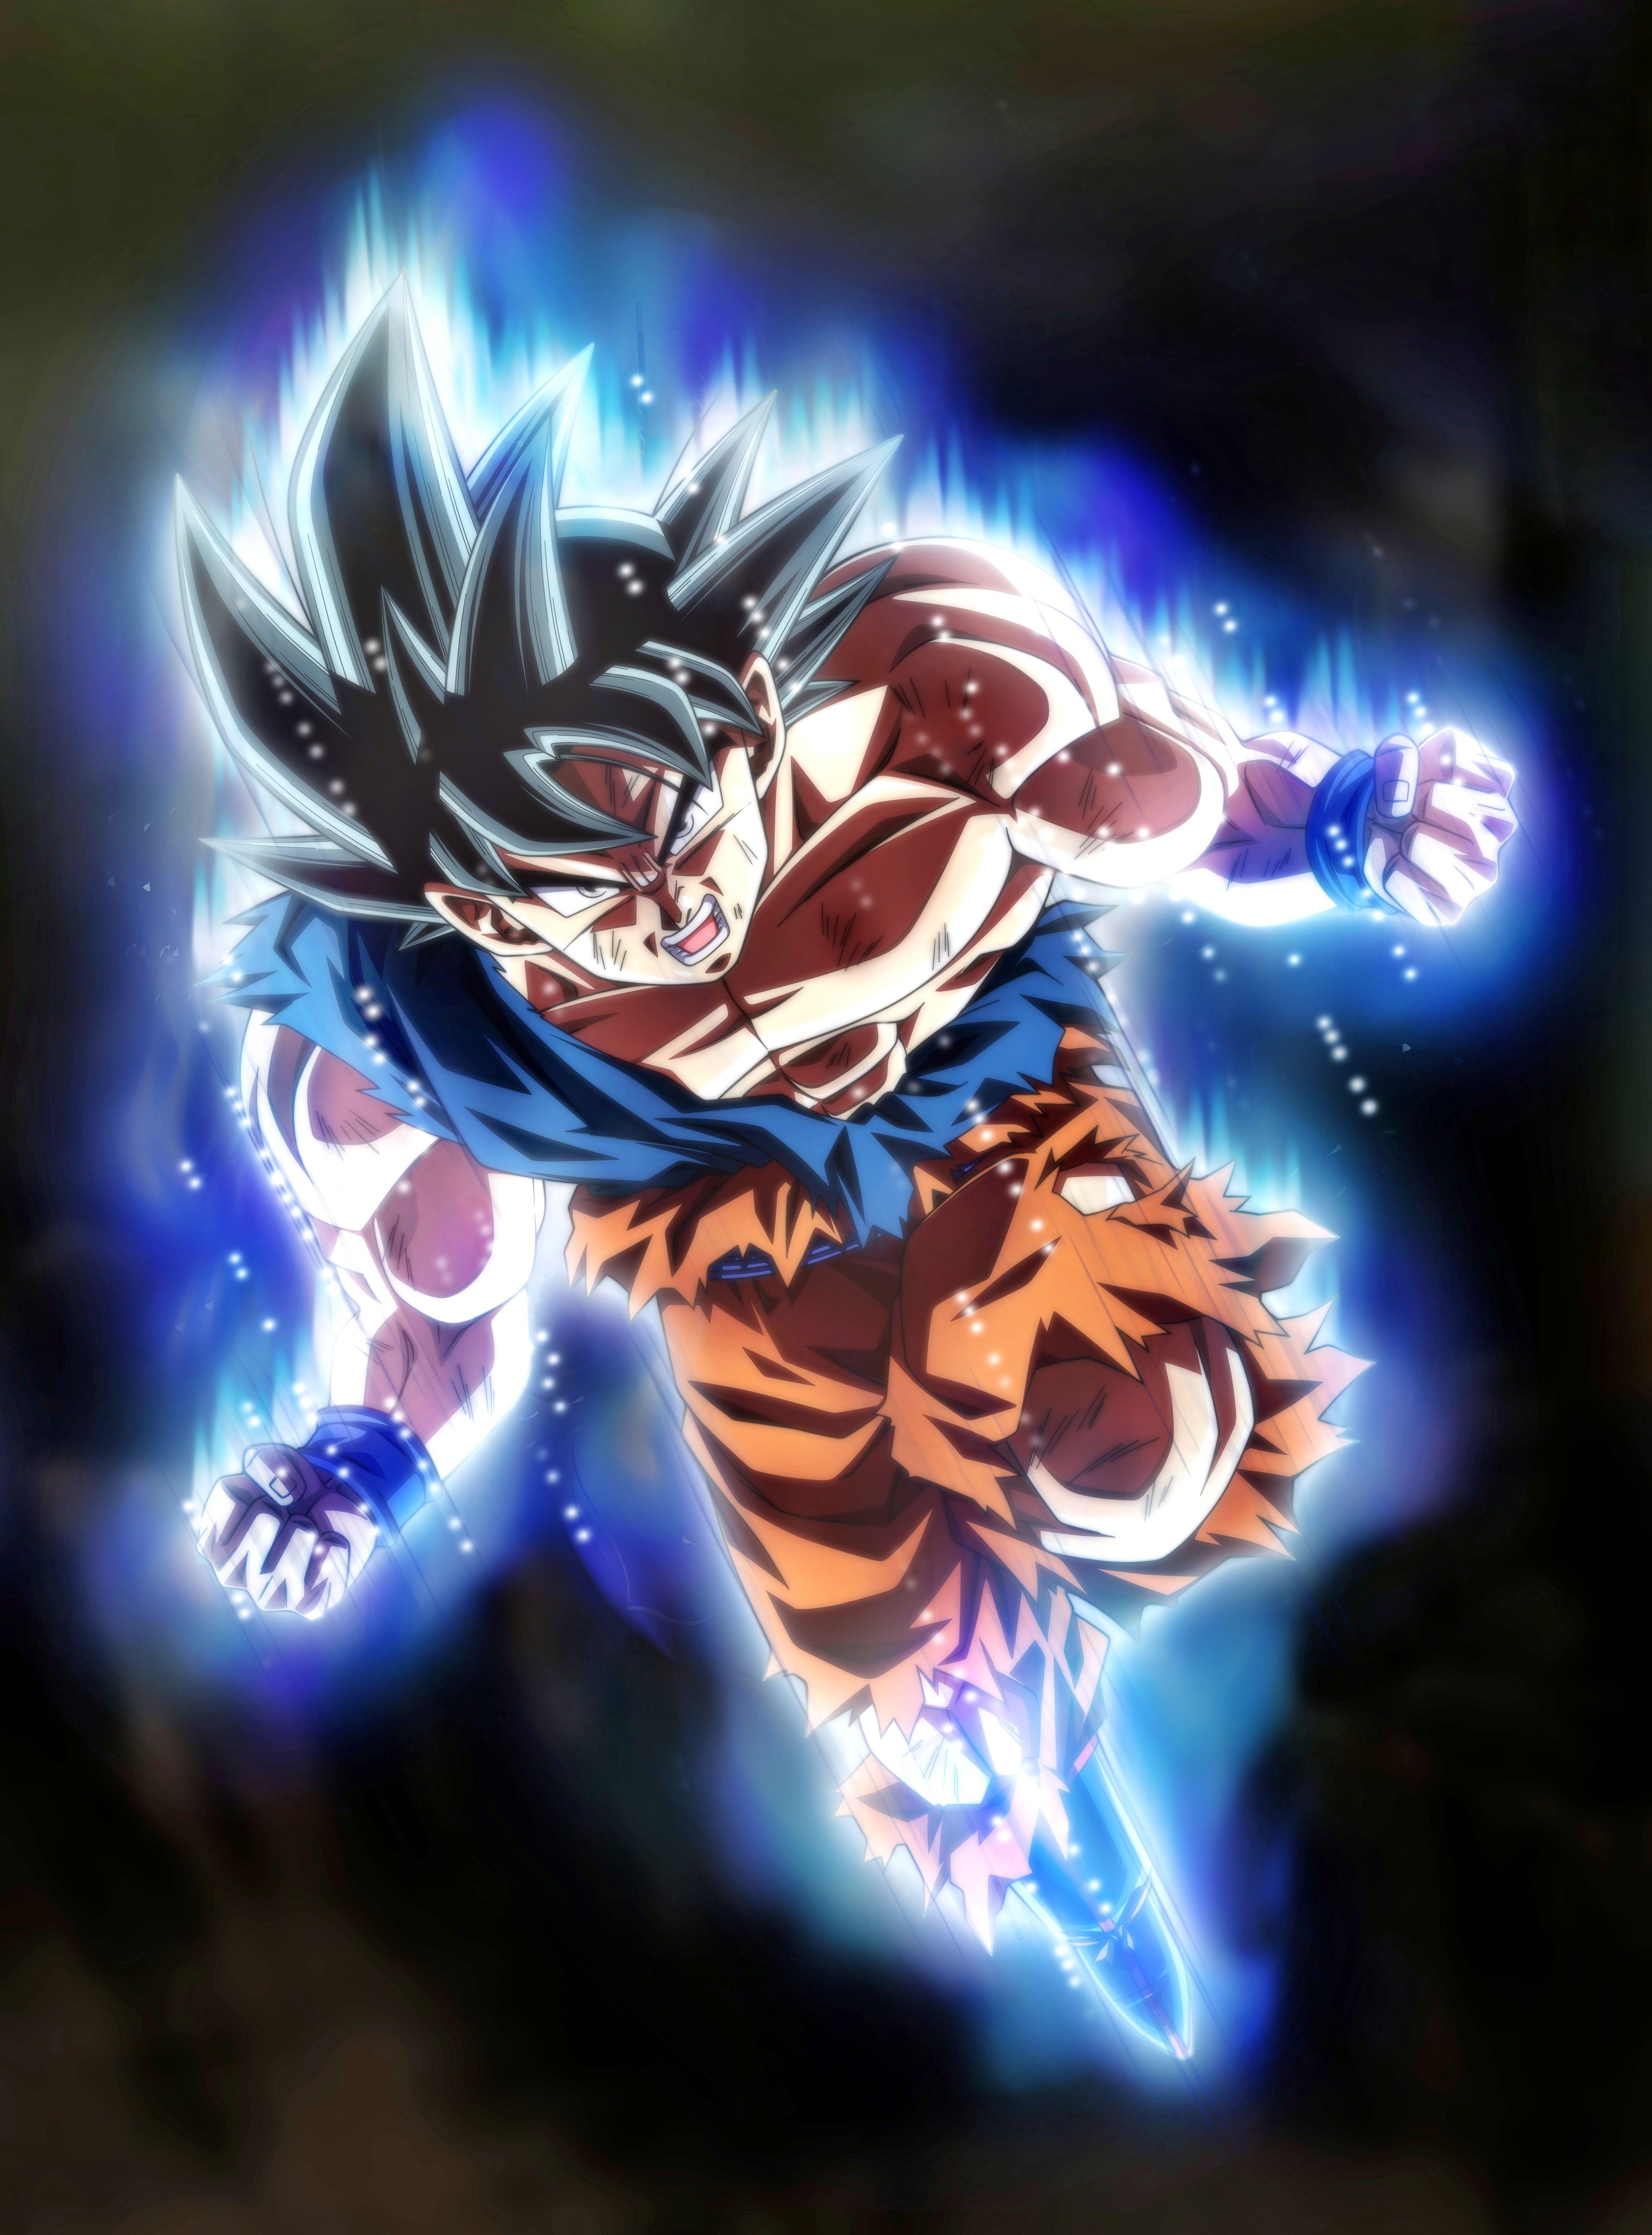 Goku Ultra Instinto Universo 7 Dragon Ball Super Goku Anime Dragon Ball Super Goku Wallpaper